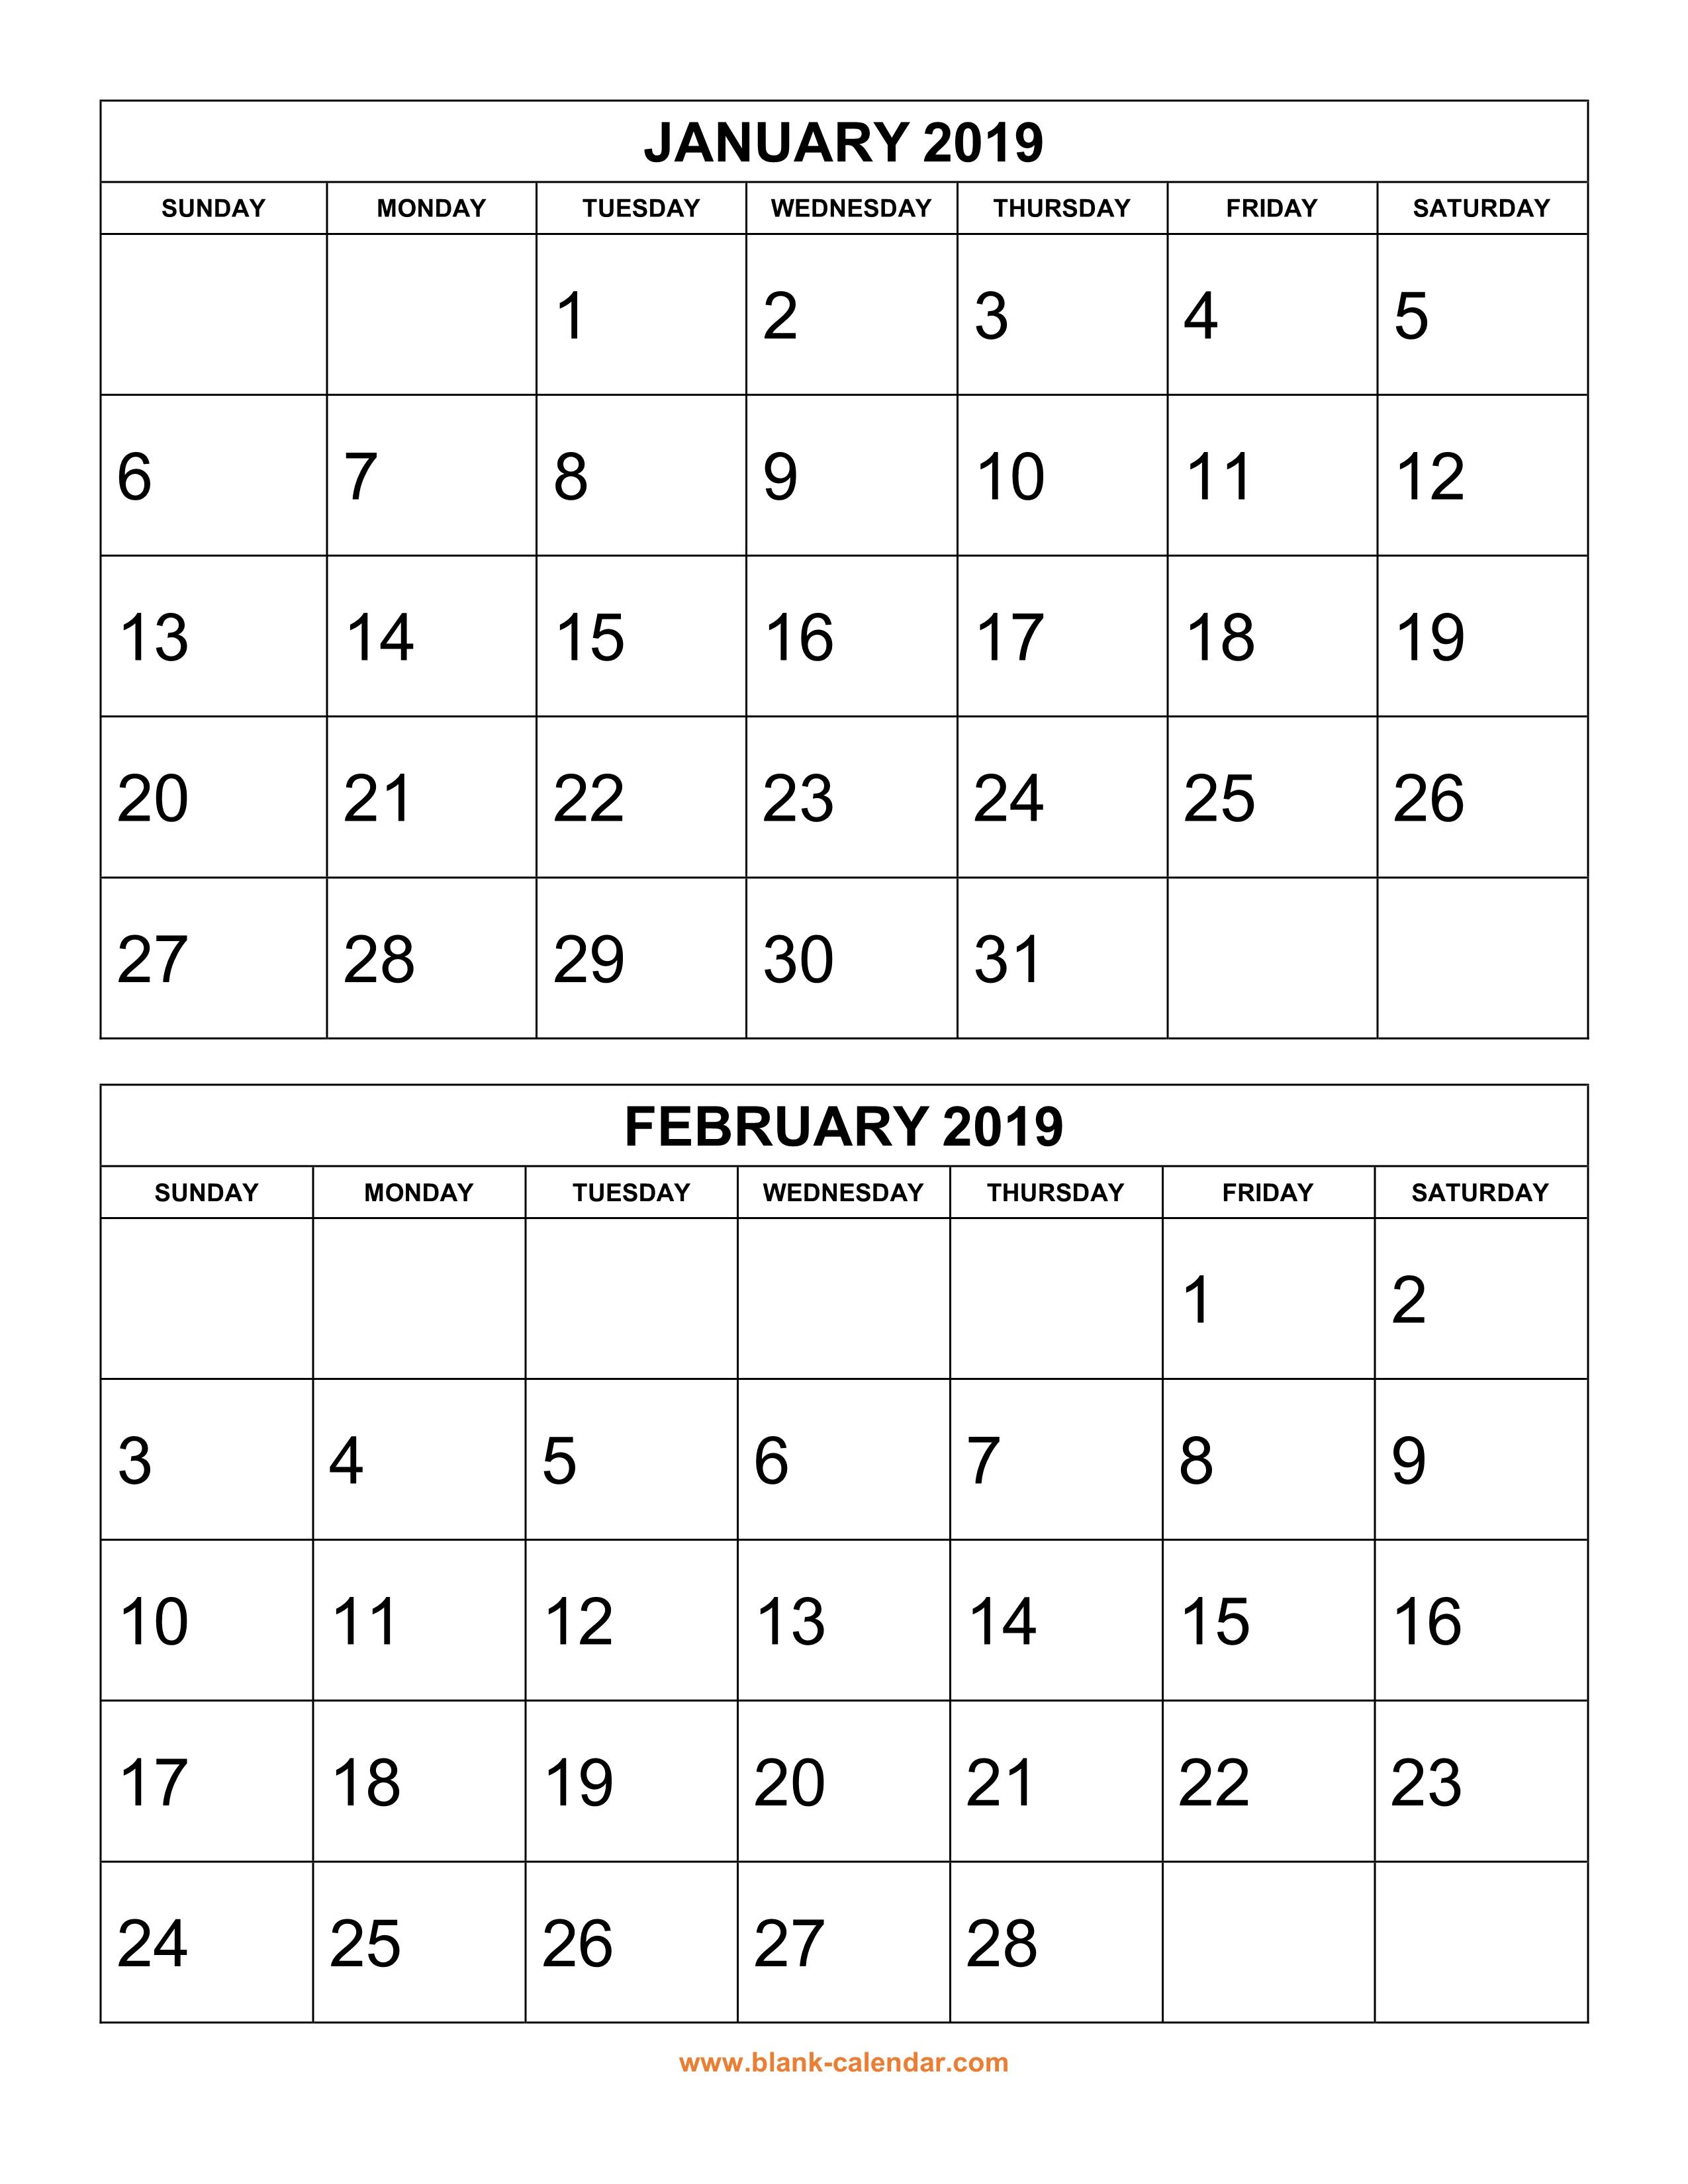 Free Download Printable Calendar 2019, 2 Months Per Page, 6 pertaining to Printable Calendar 4 Months Per Page